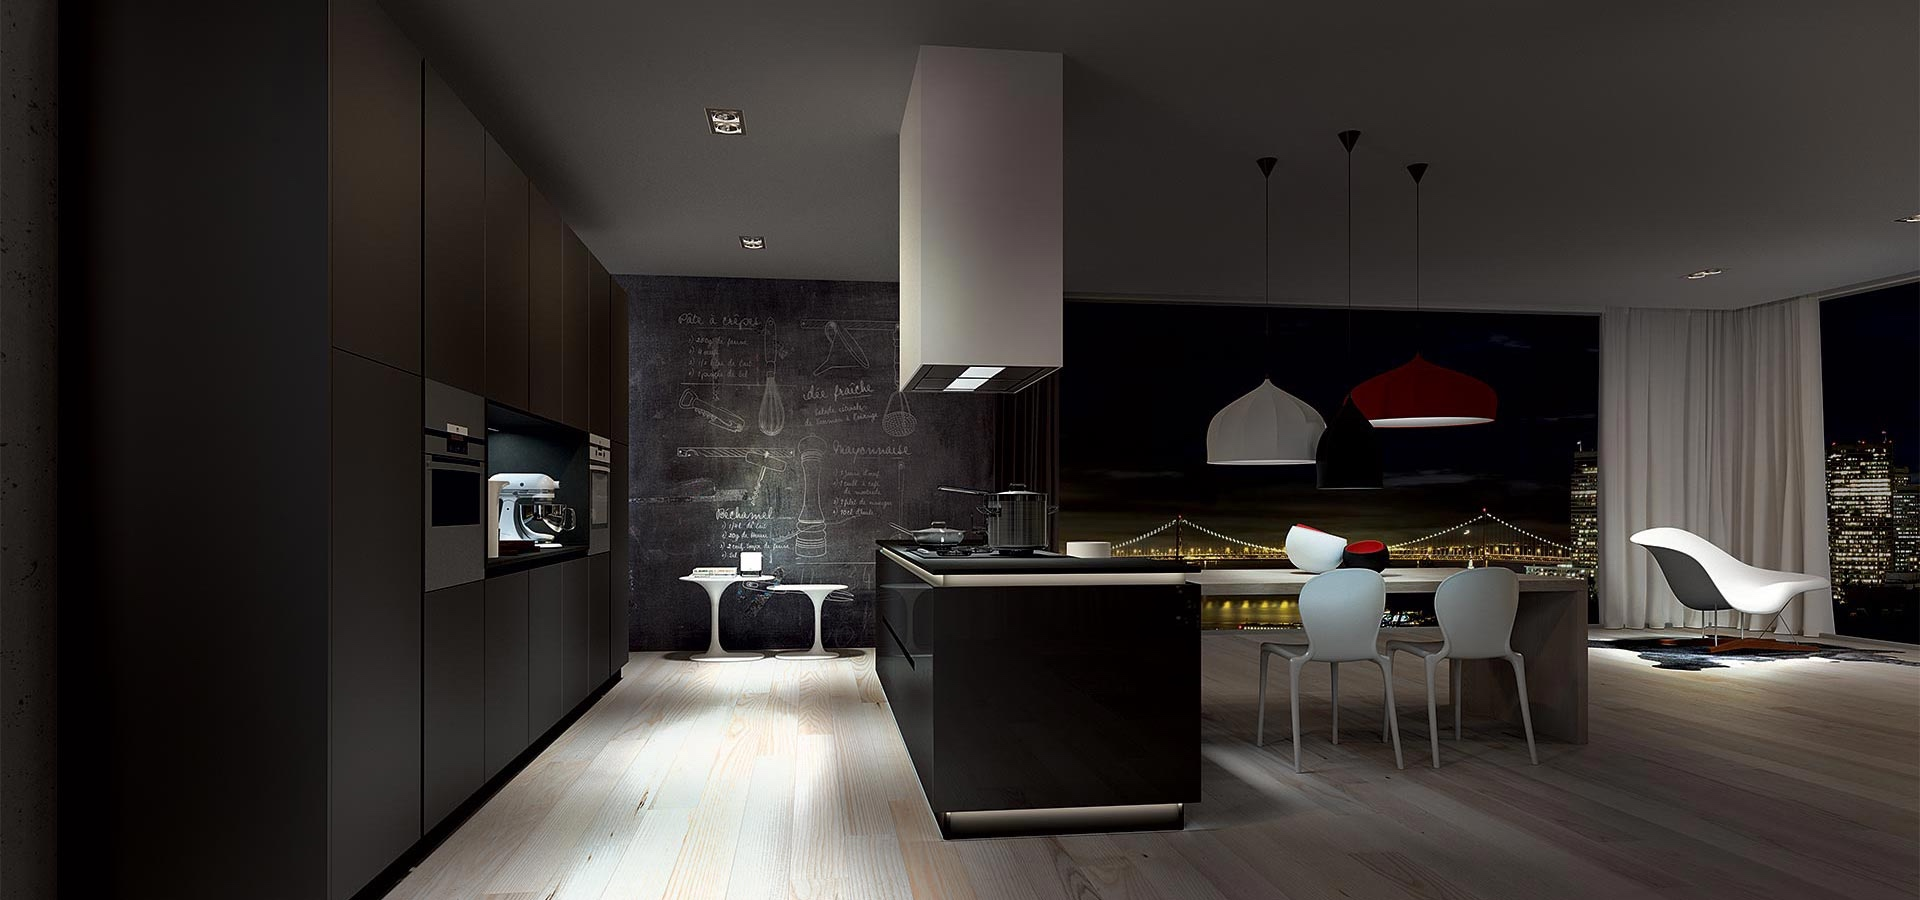 Cucina Glass Arredo 3